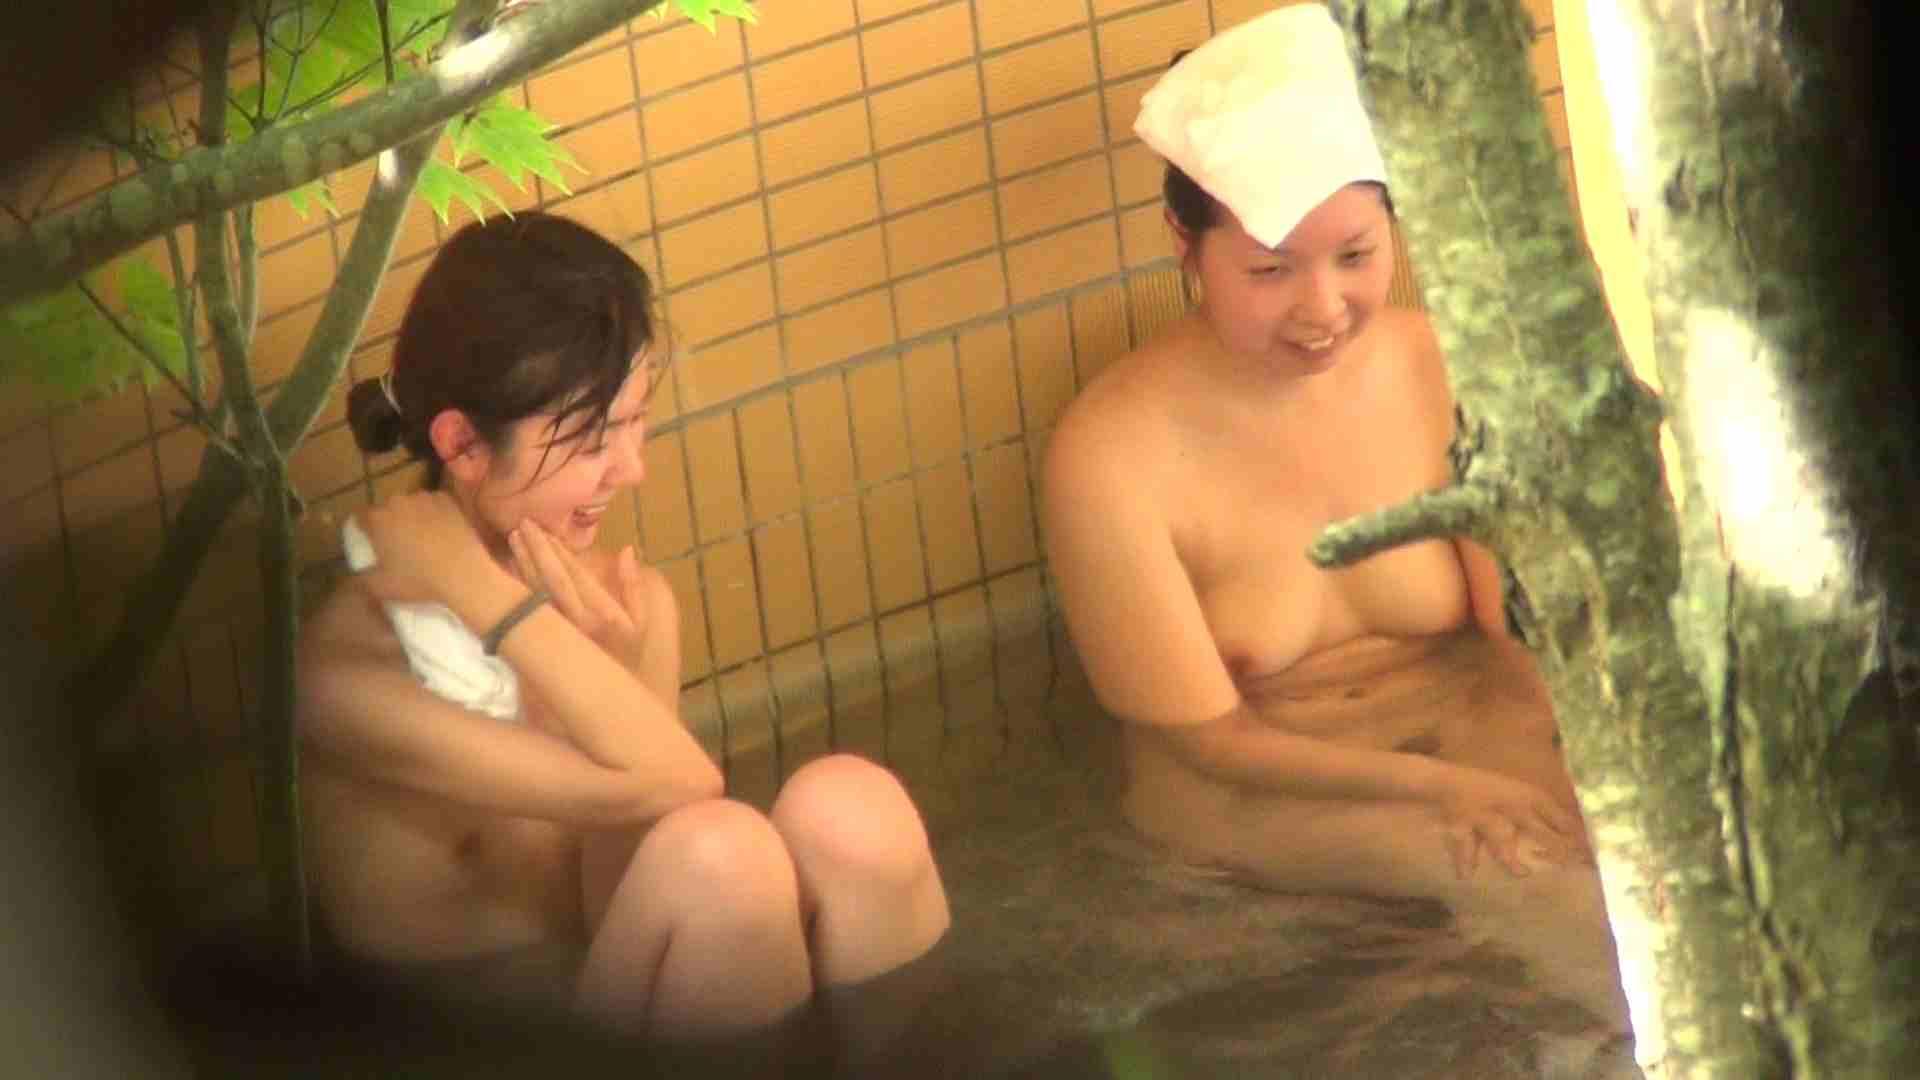 Aquaな露天風呂Vol.307 OLのエロ生活 | 露天風呂  30連発 22